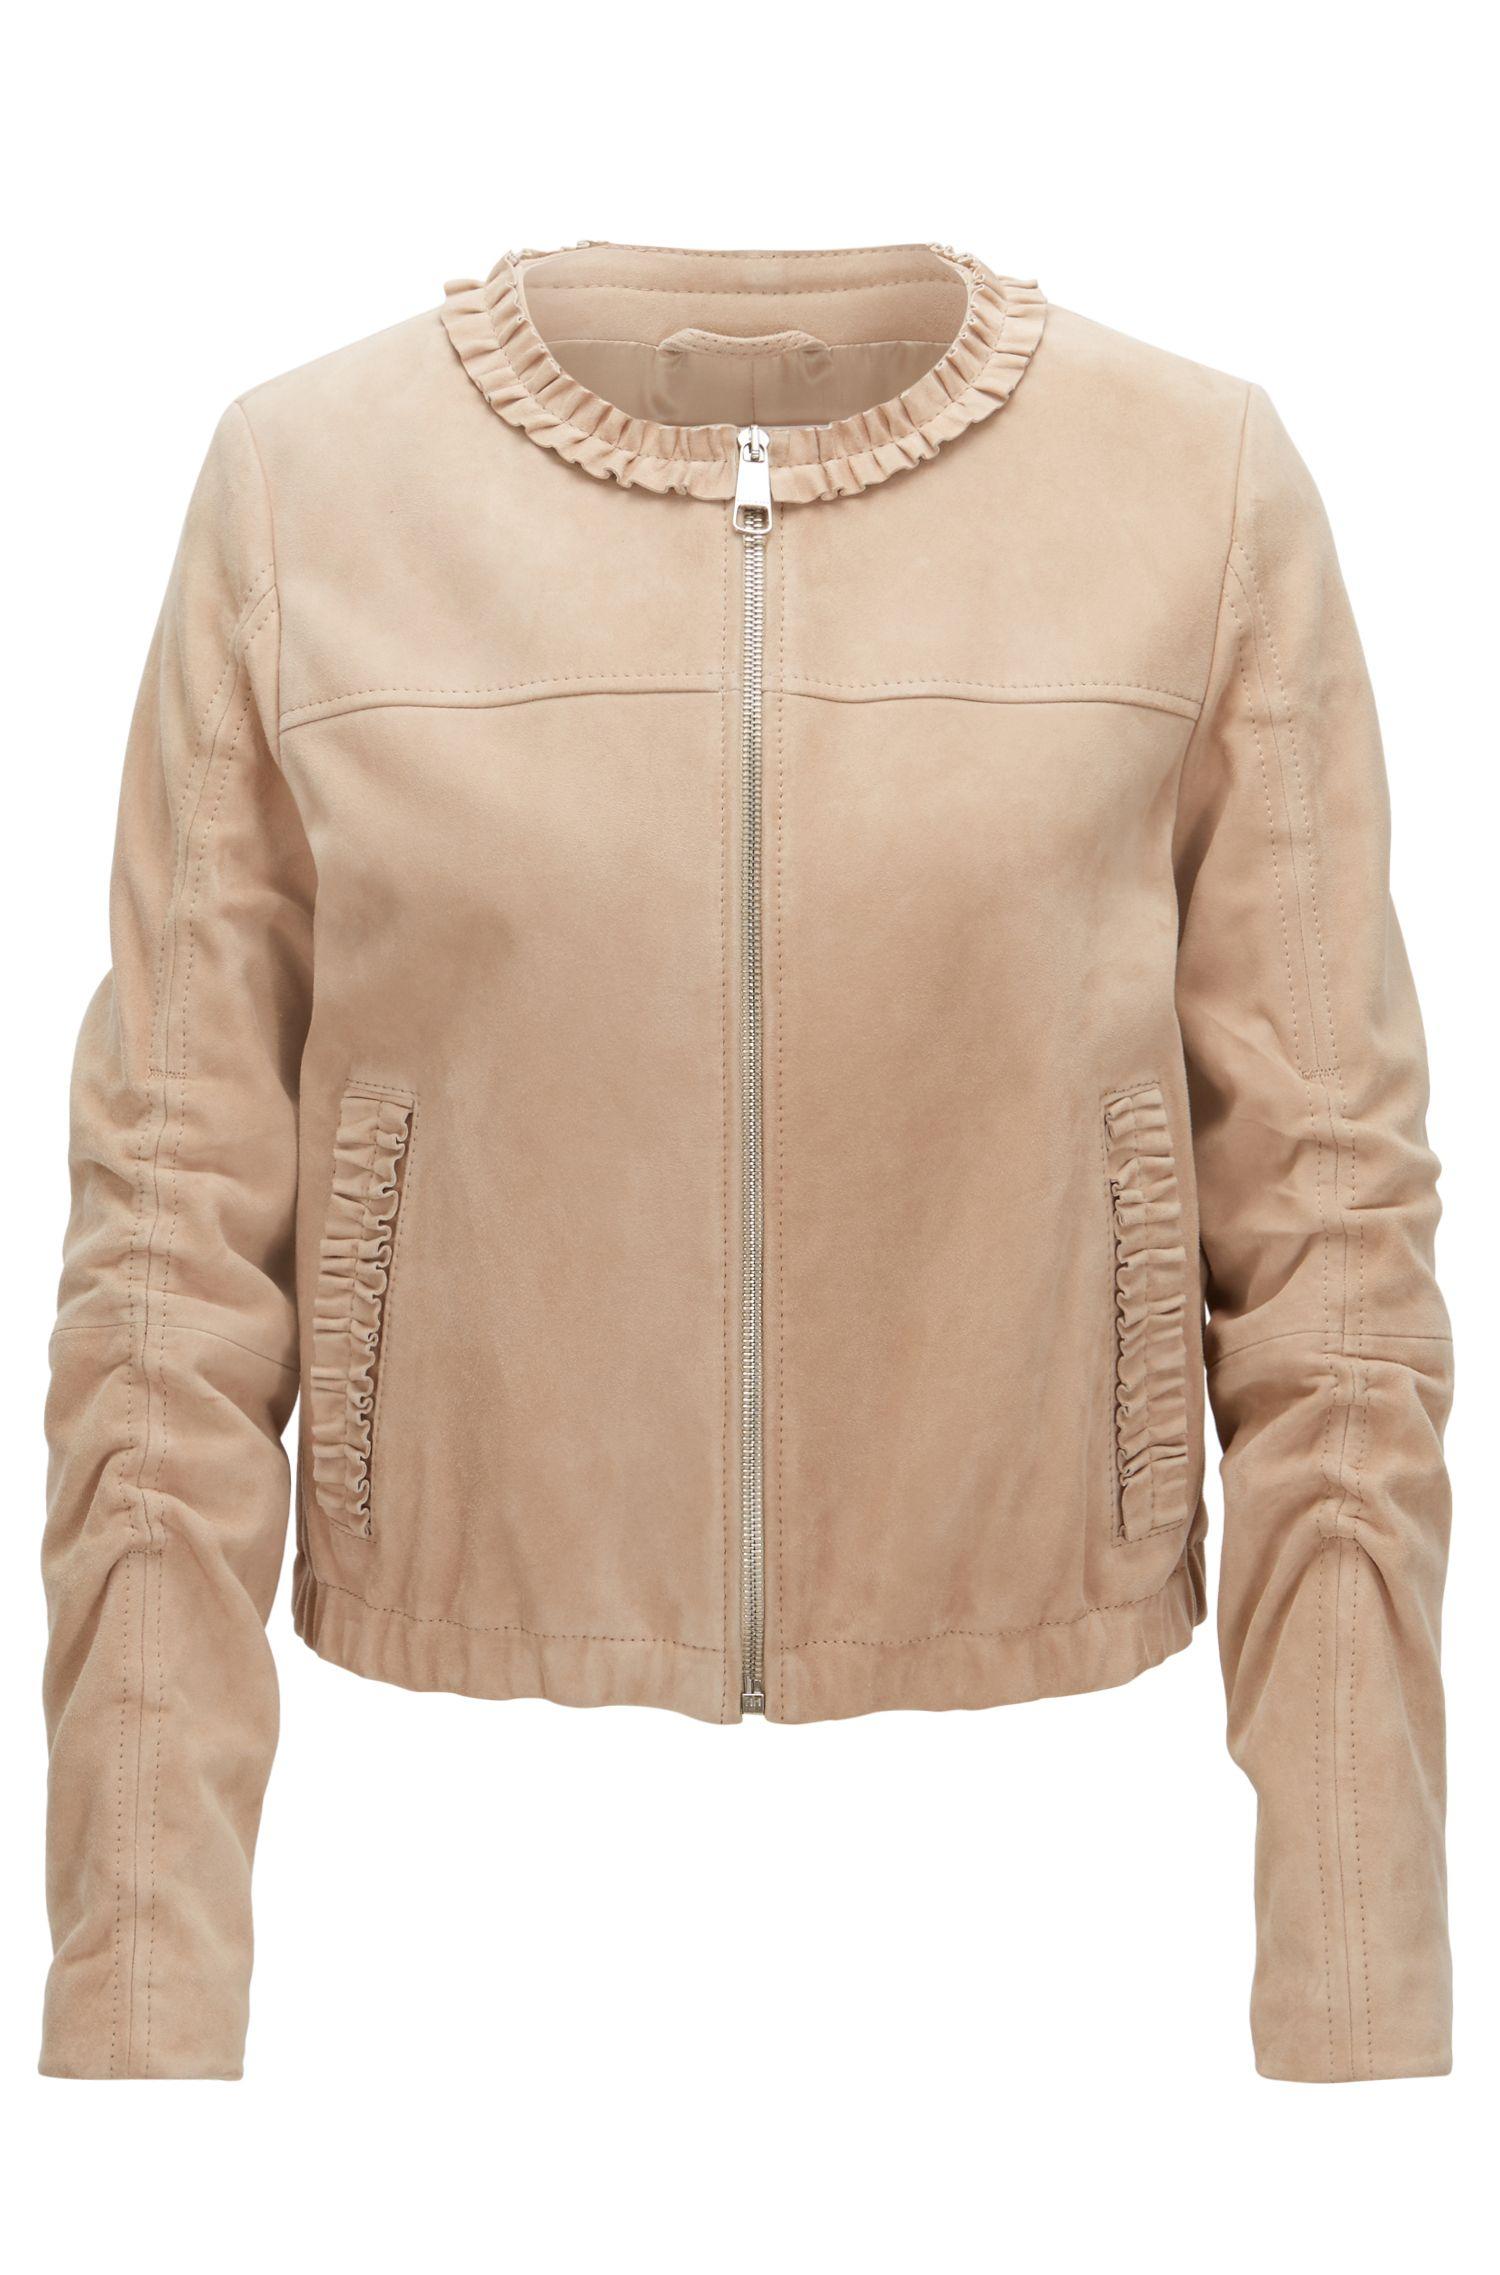 Ruffled Suede Leather Jacket | Sakrone, Beige